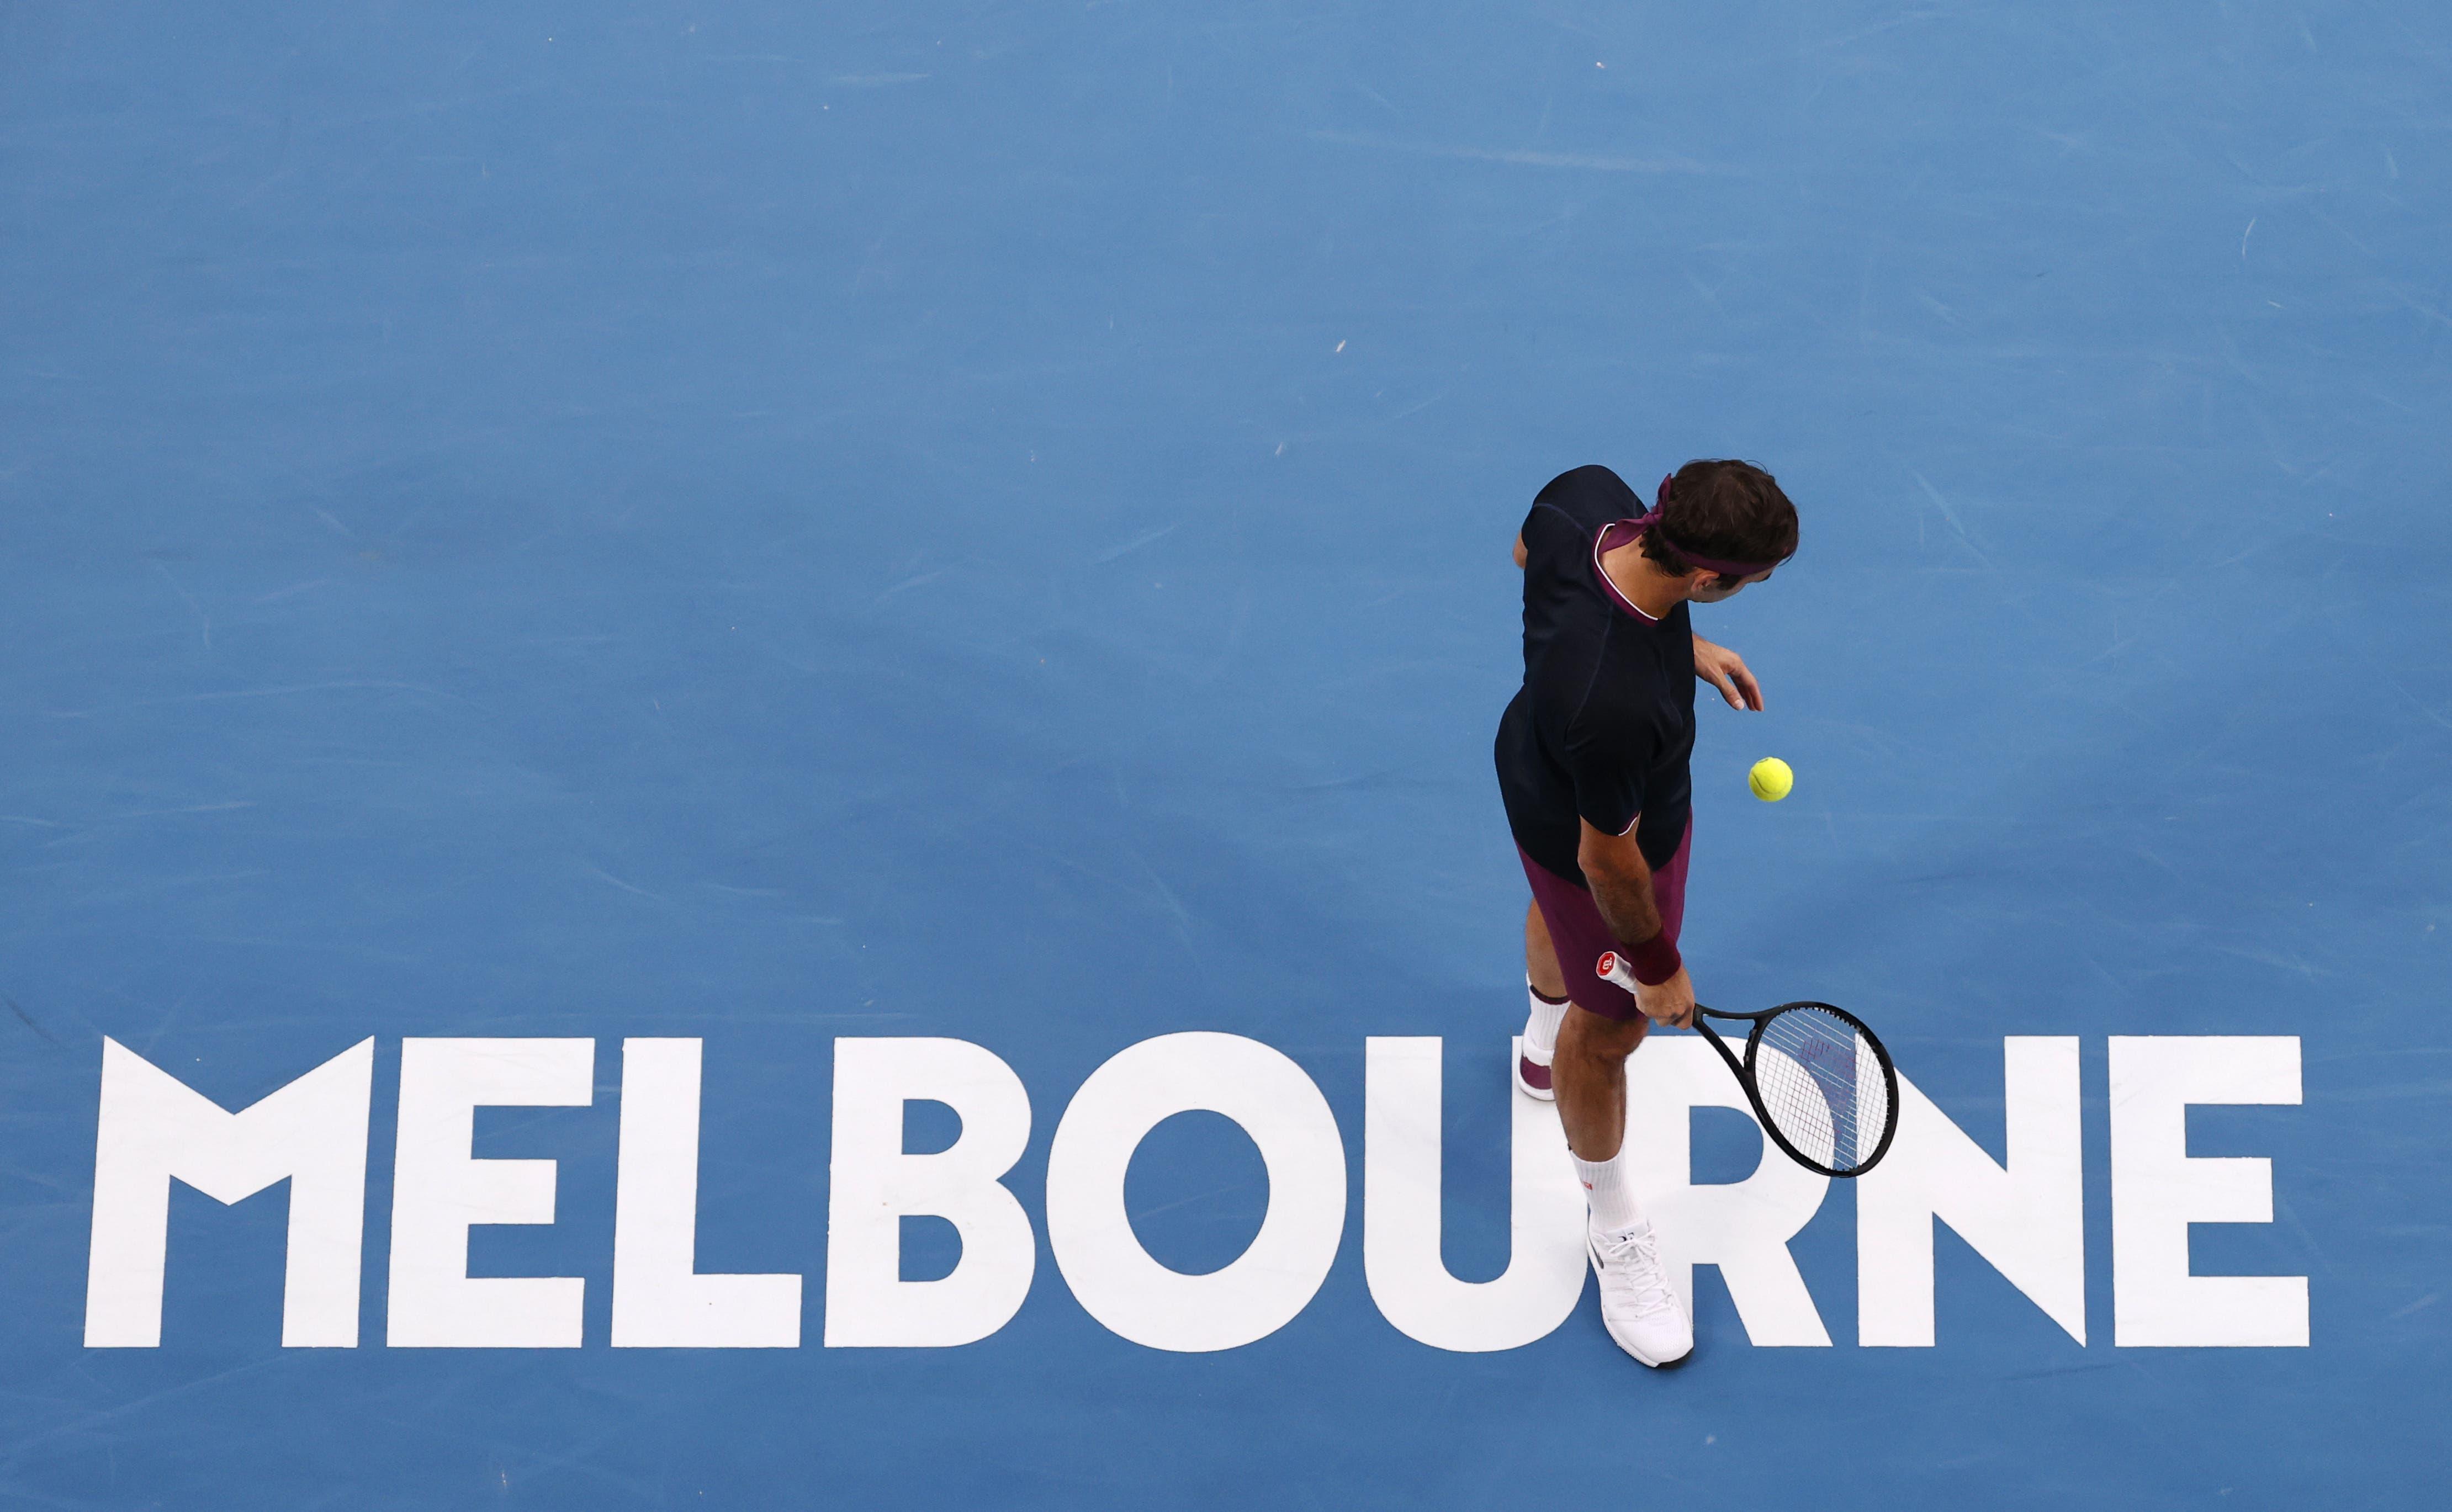 Roger Federer im Halbfinal des Australian Open in Melbourne gegen Novak Djokovic an.